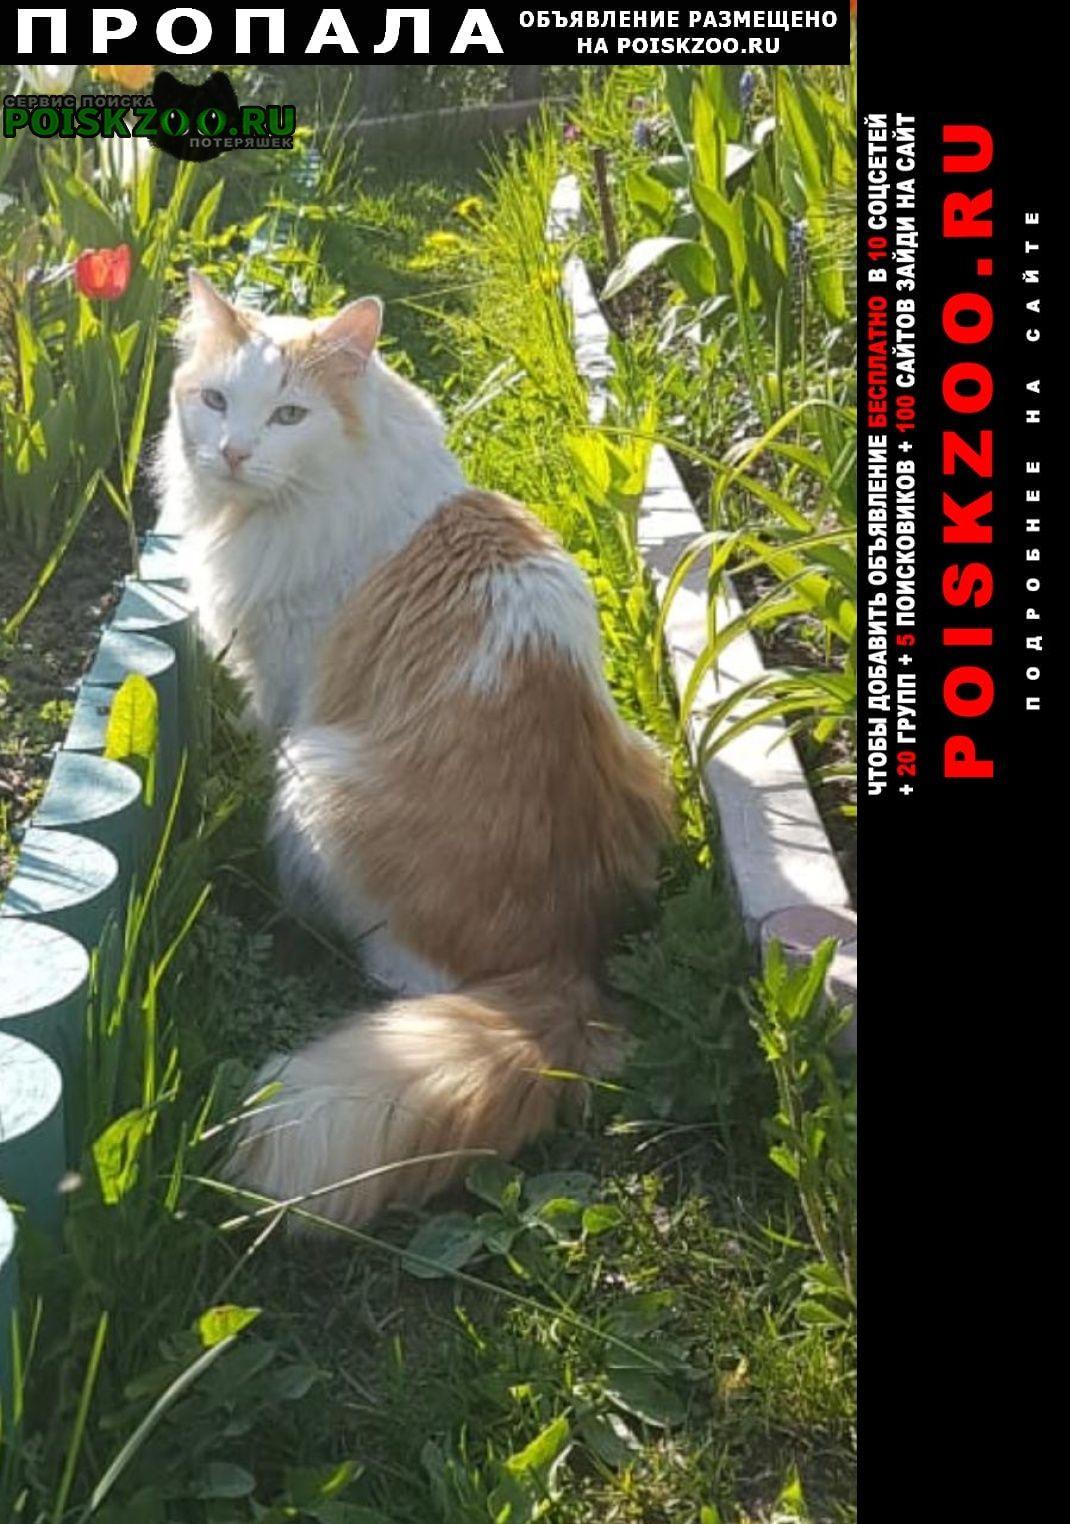 Пропал кот помогите найти кешу Санкт-Петербург